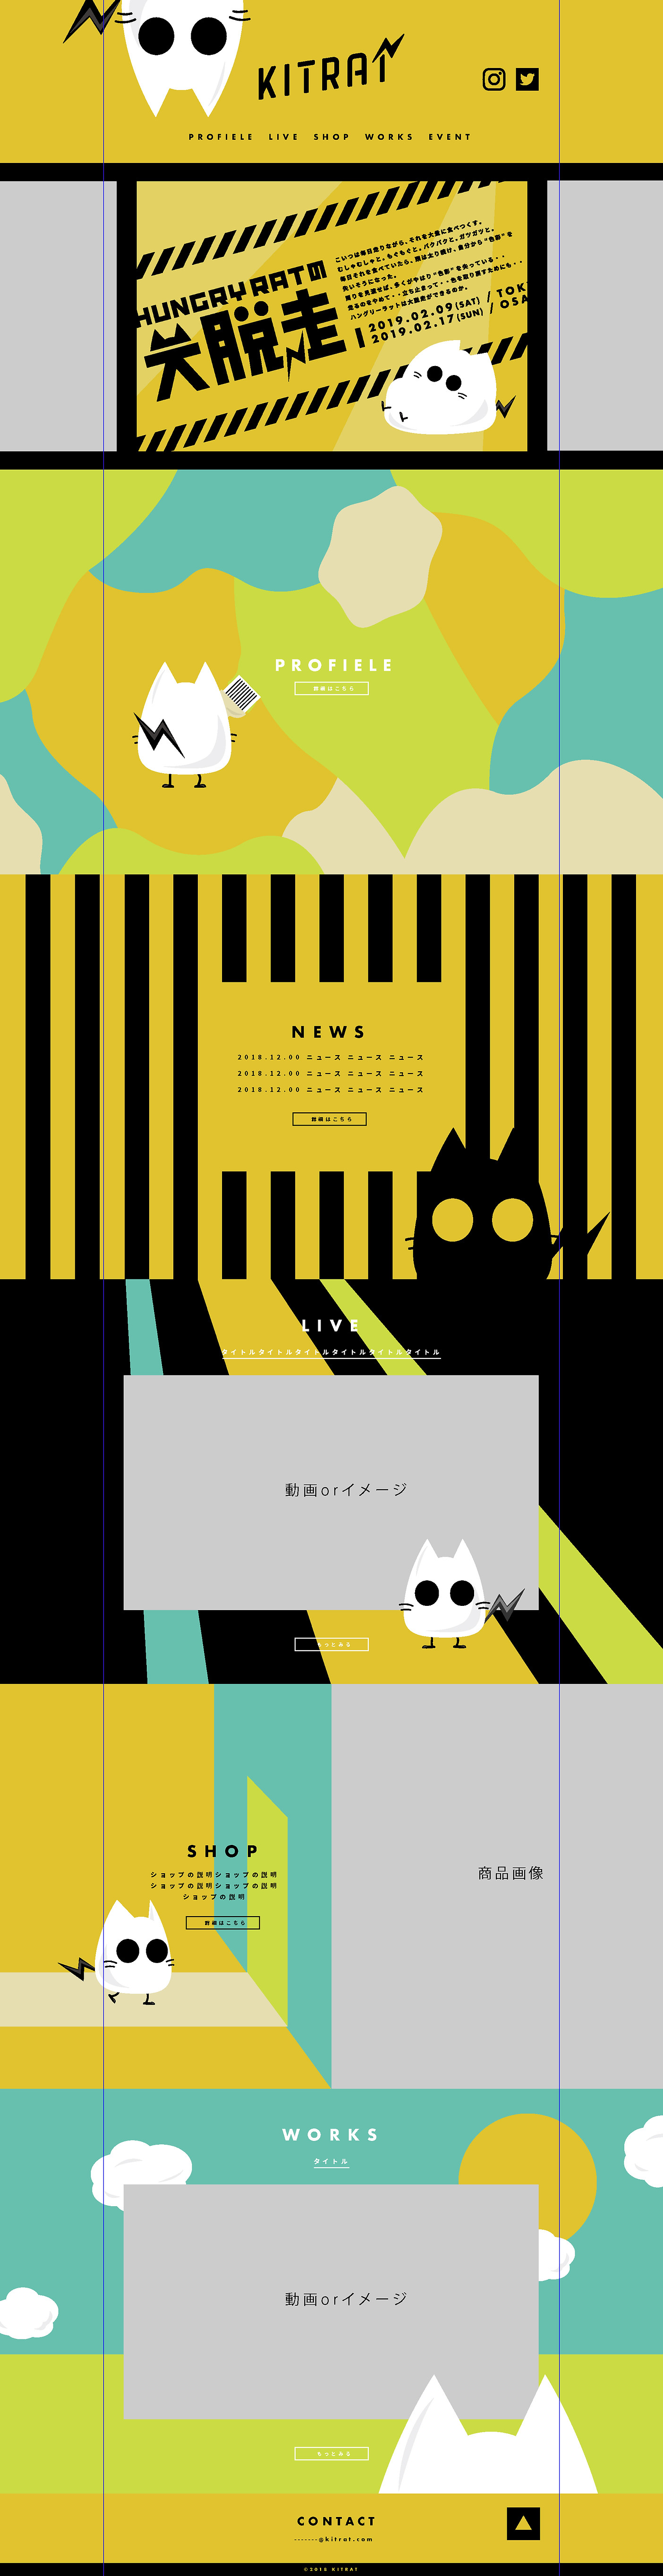 KITRAT_web_pc_01.jpg